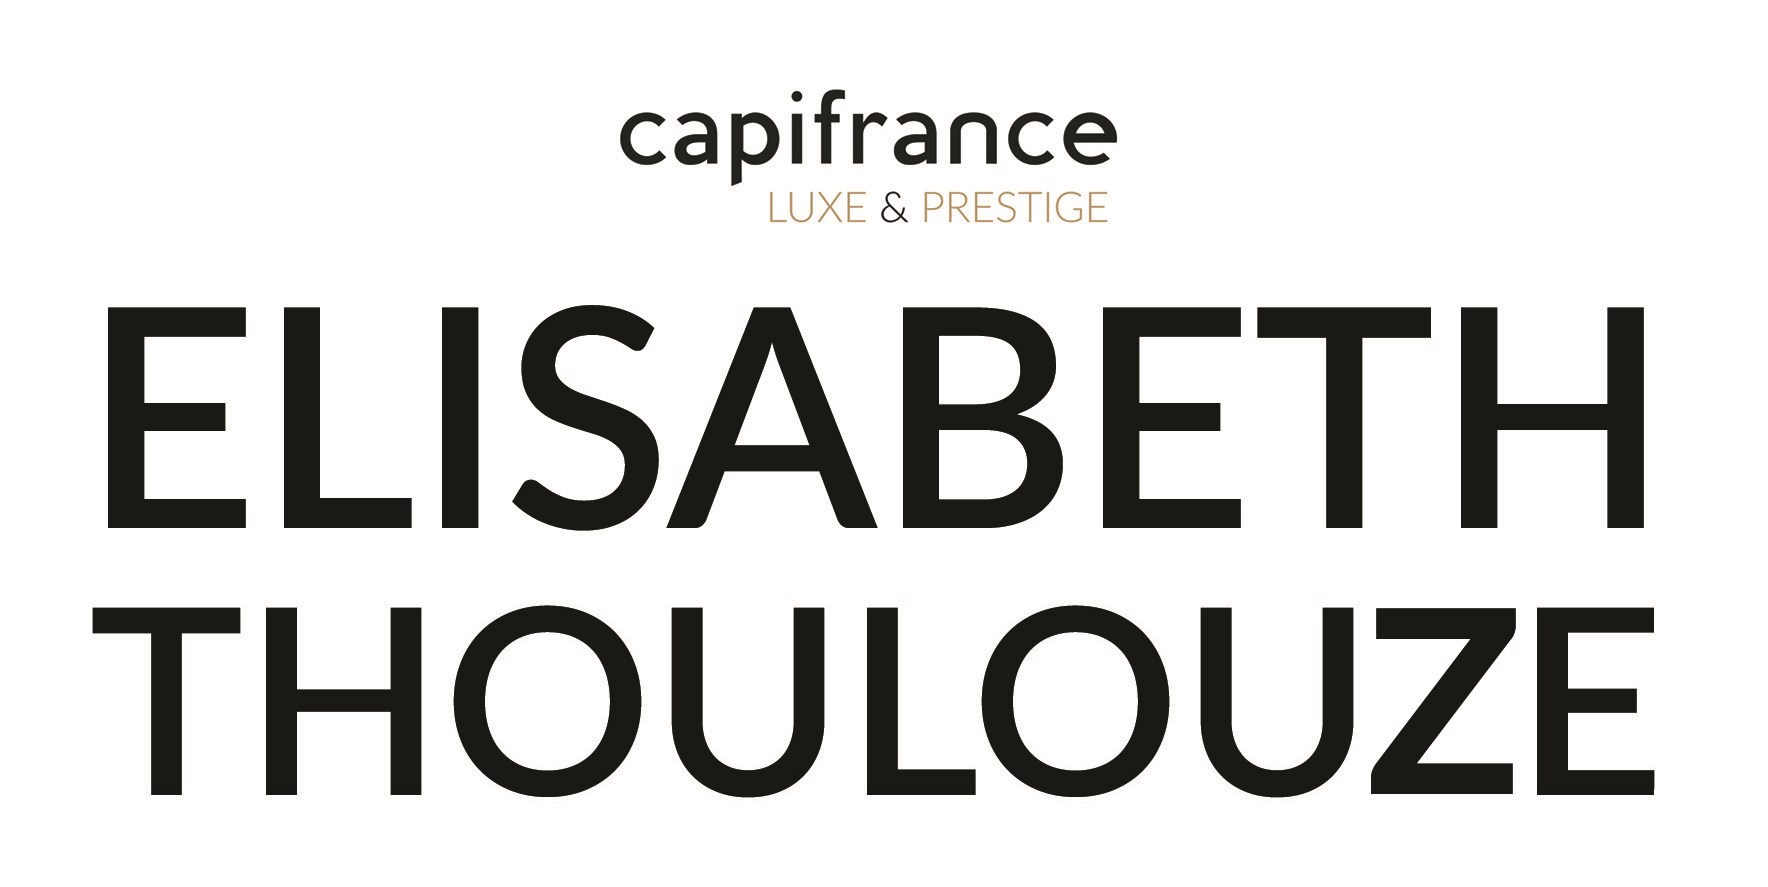 Real estate agency THOULOUZE Elisabeth - CAPI France in MONTPELLIER